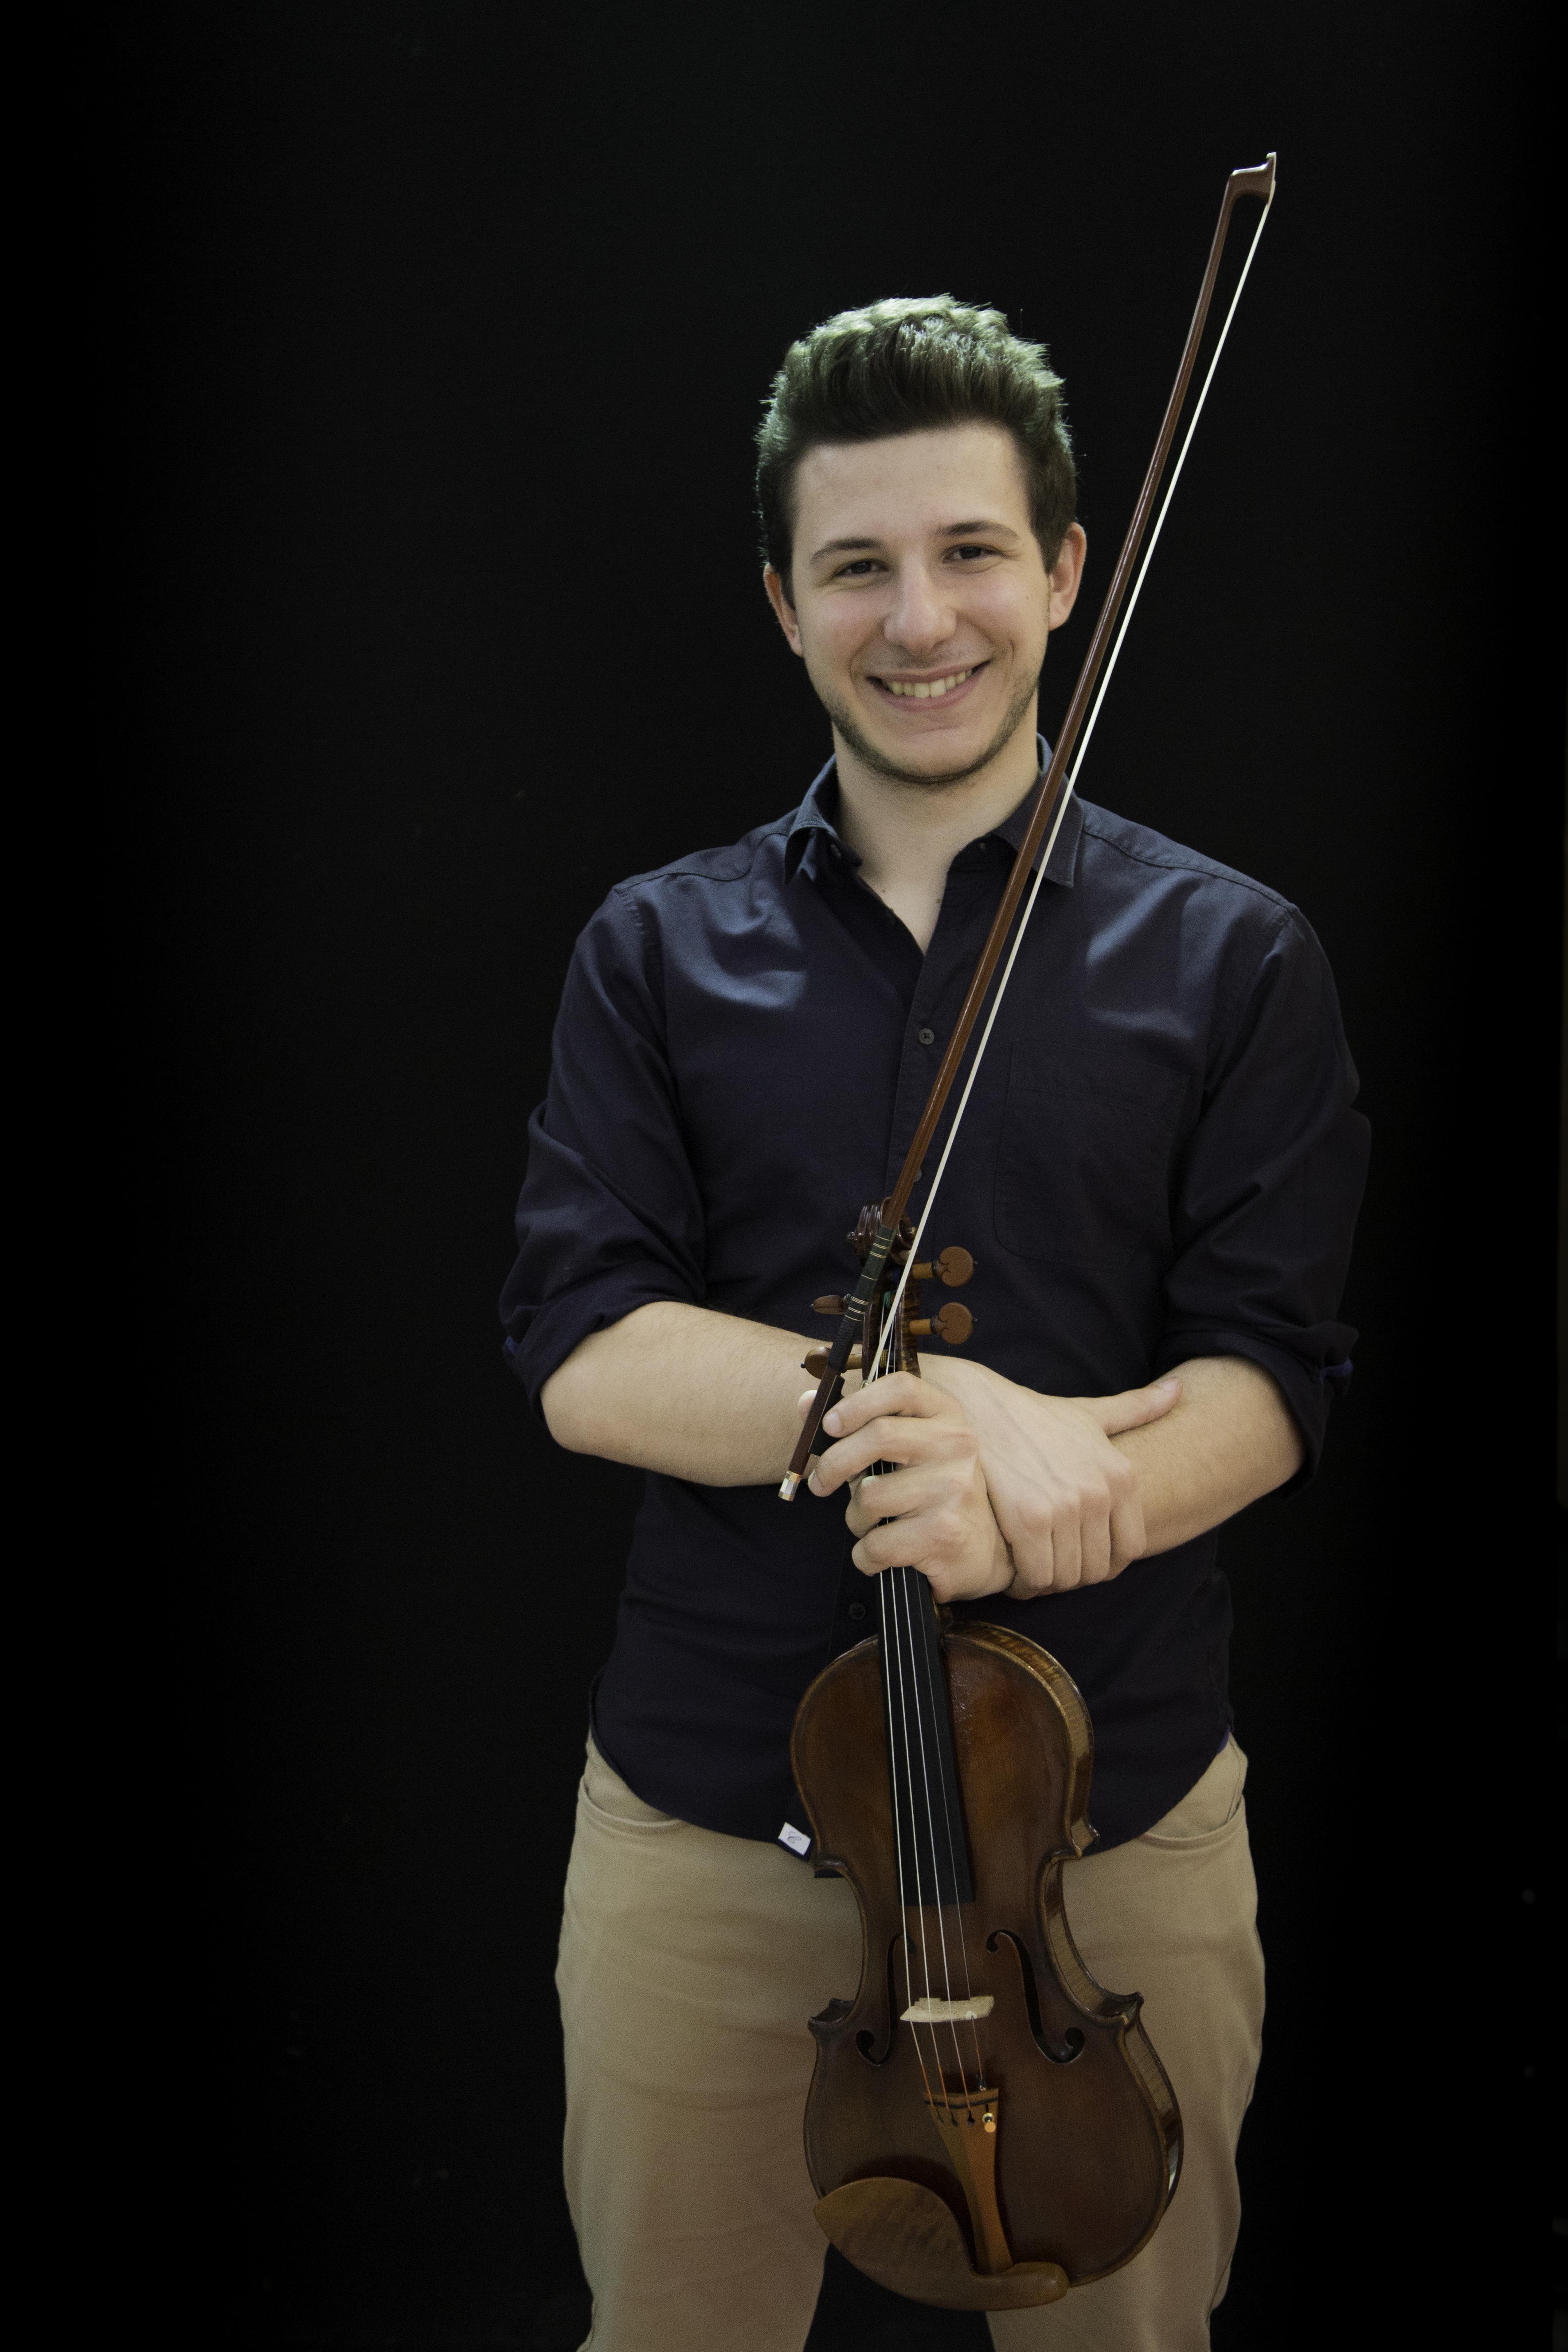 Daniele Negrini Violino